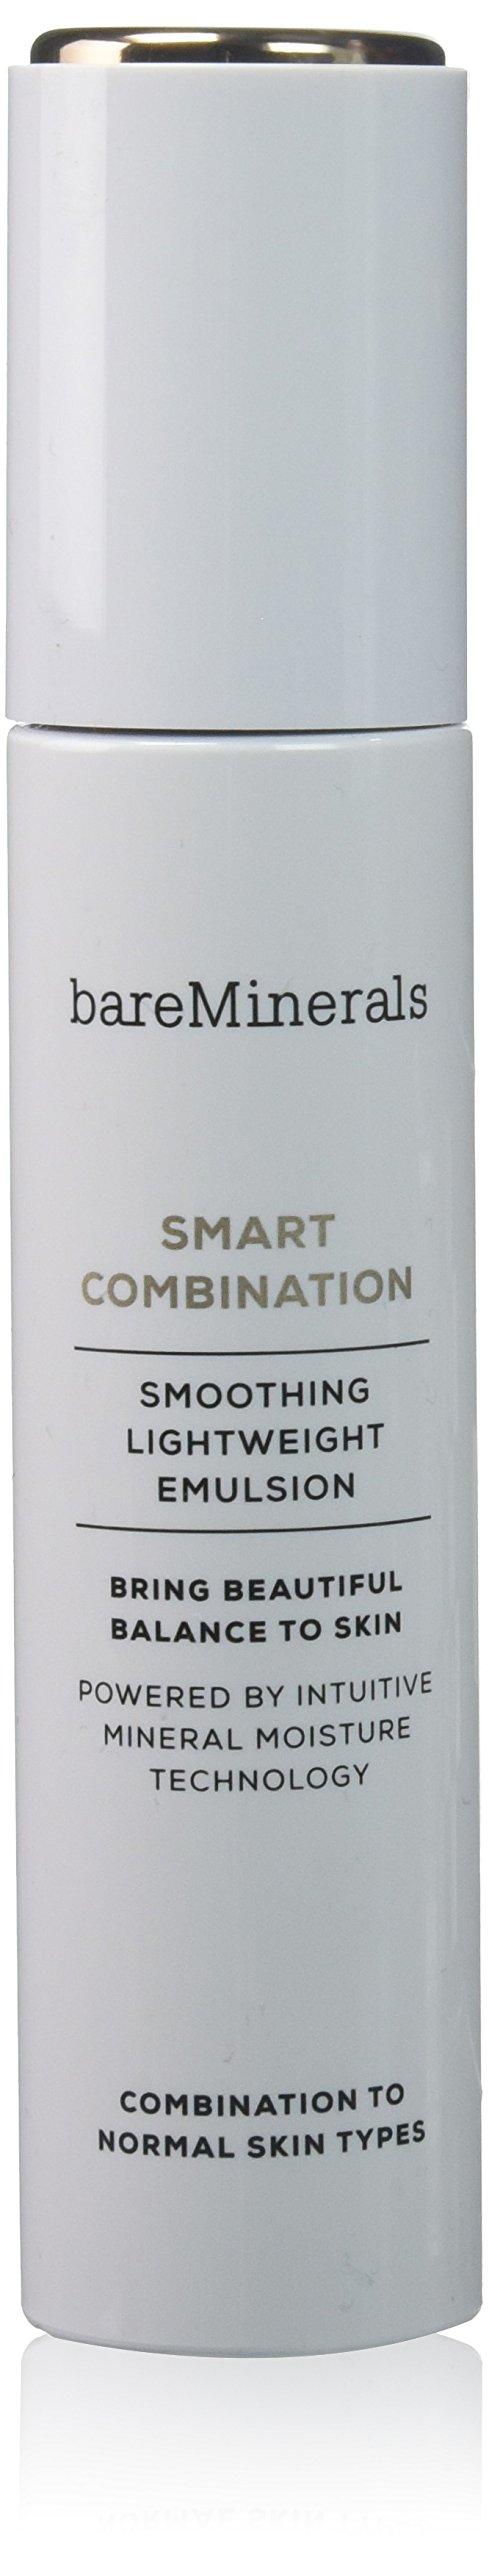 bareMinerals Smart Combination Lightweight Emulsion, 1.7 Ounce